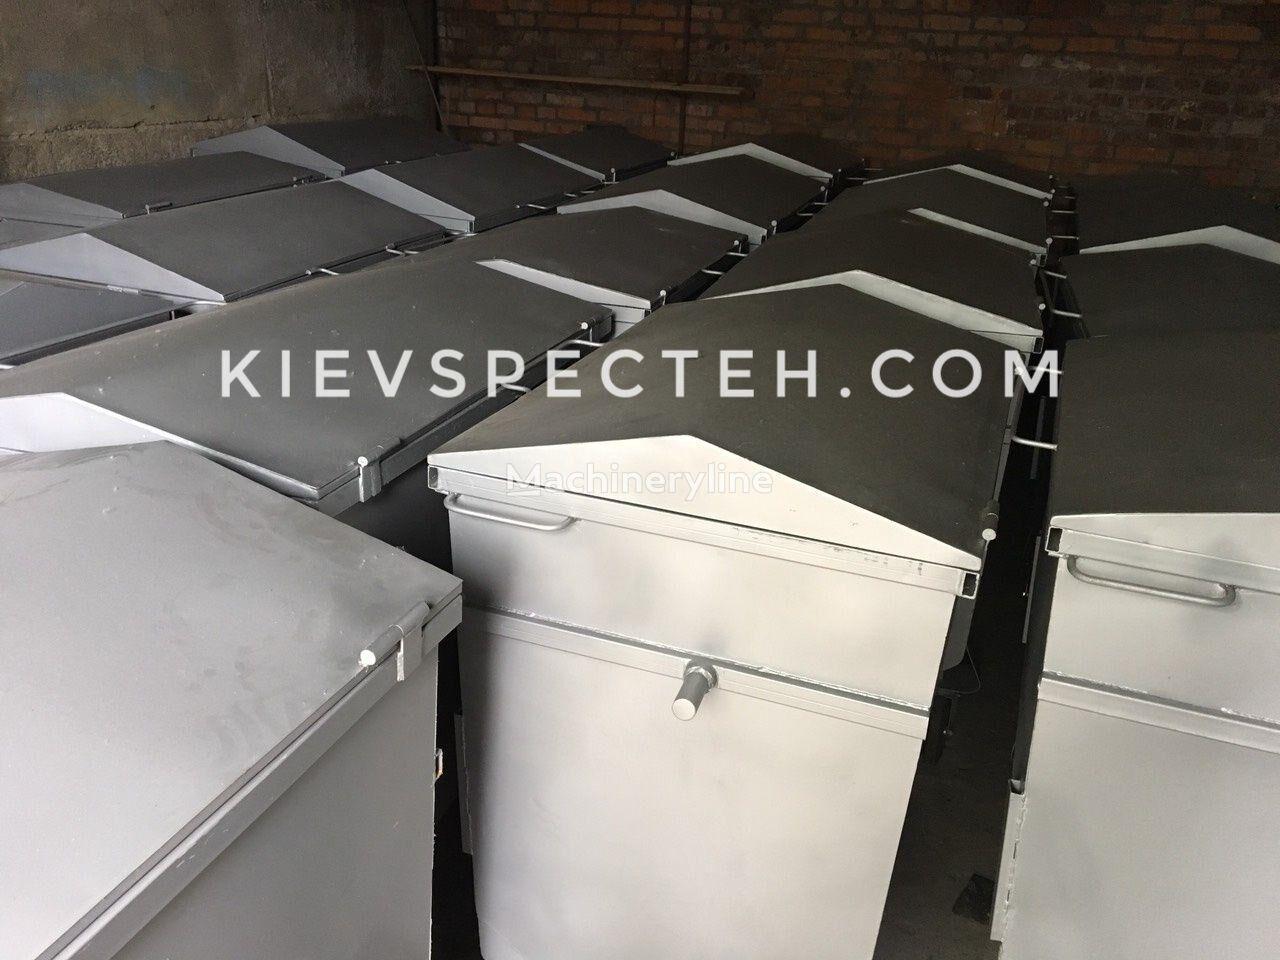 novi Evrokonteyner  metall 2 mm kontejner za smeće